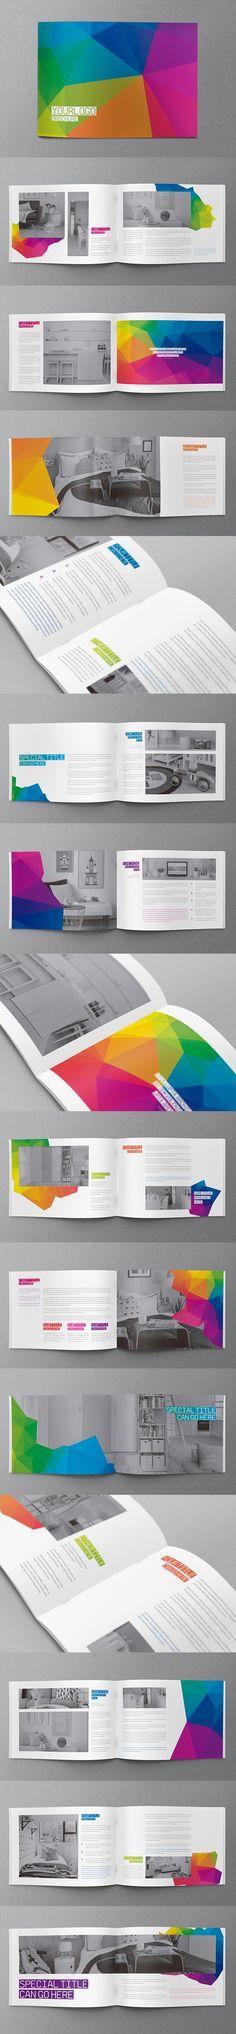 Abstract Modern Brochure on Behance